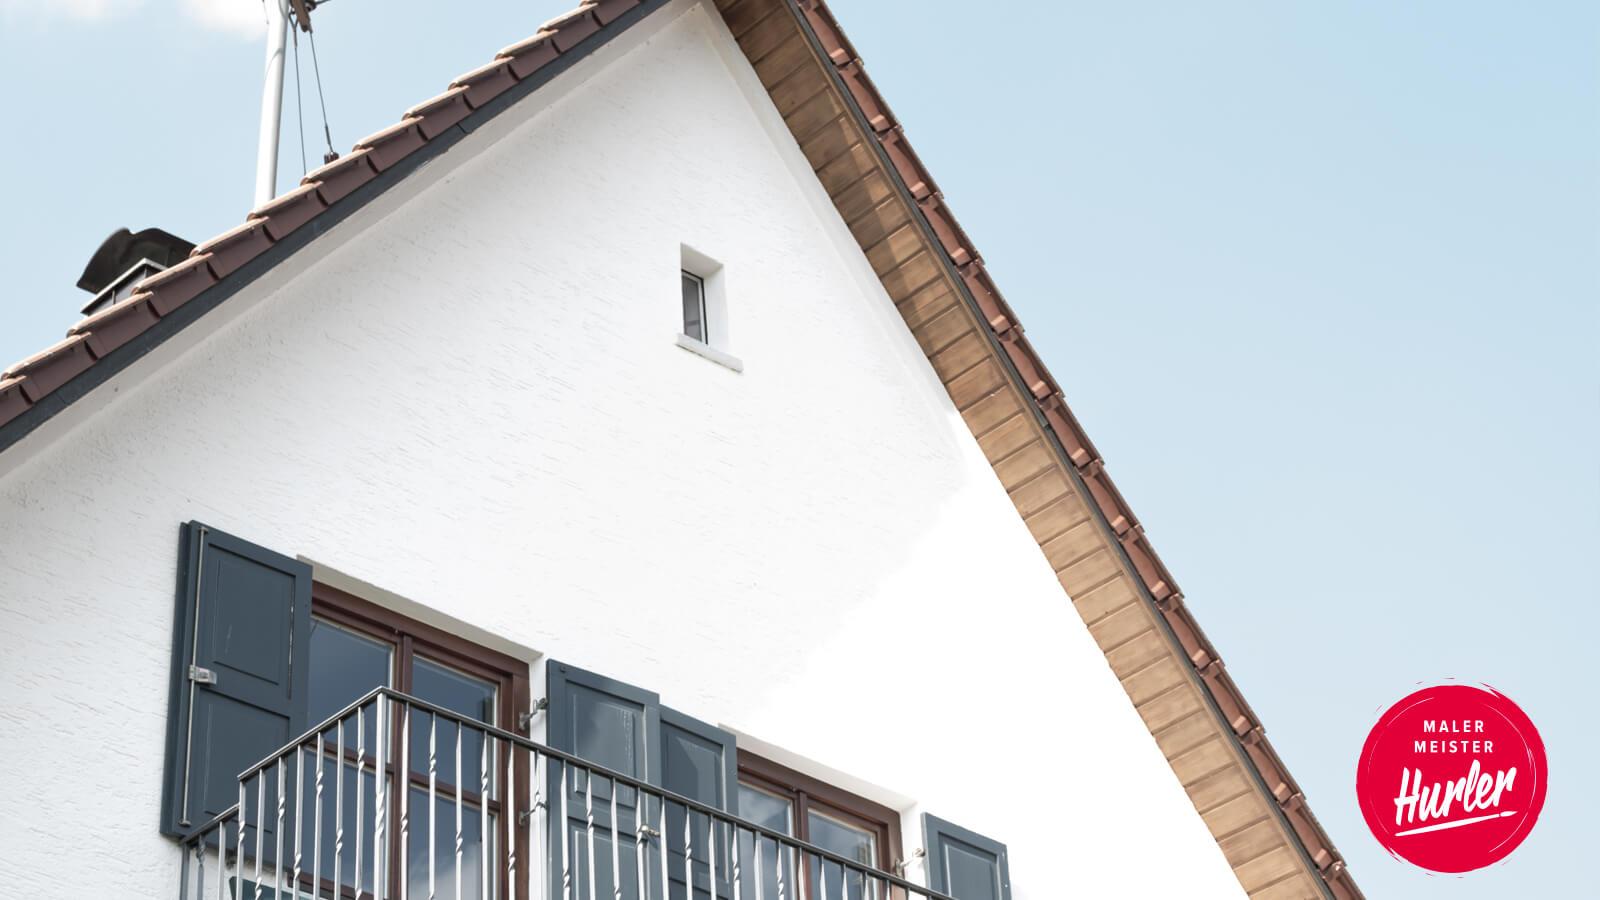 fassade hurlerhaus leinheim